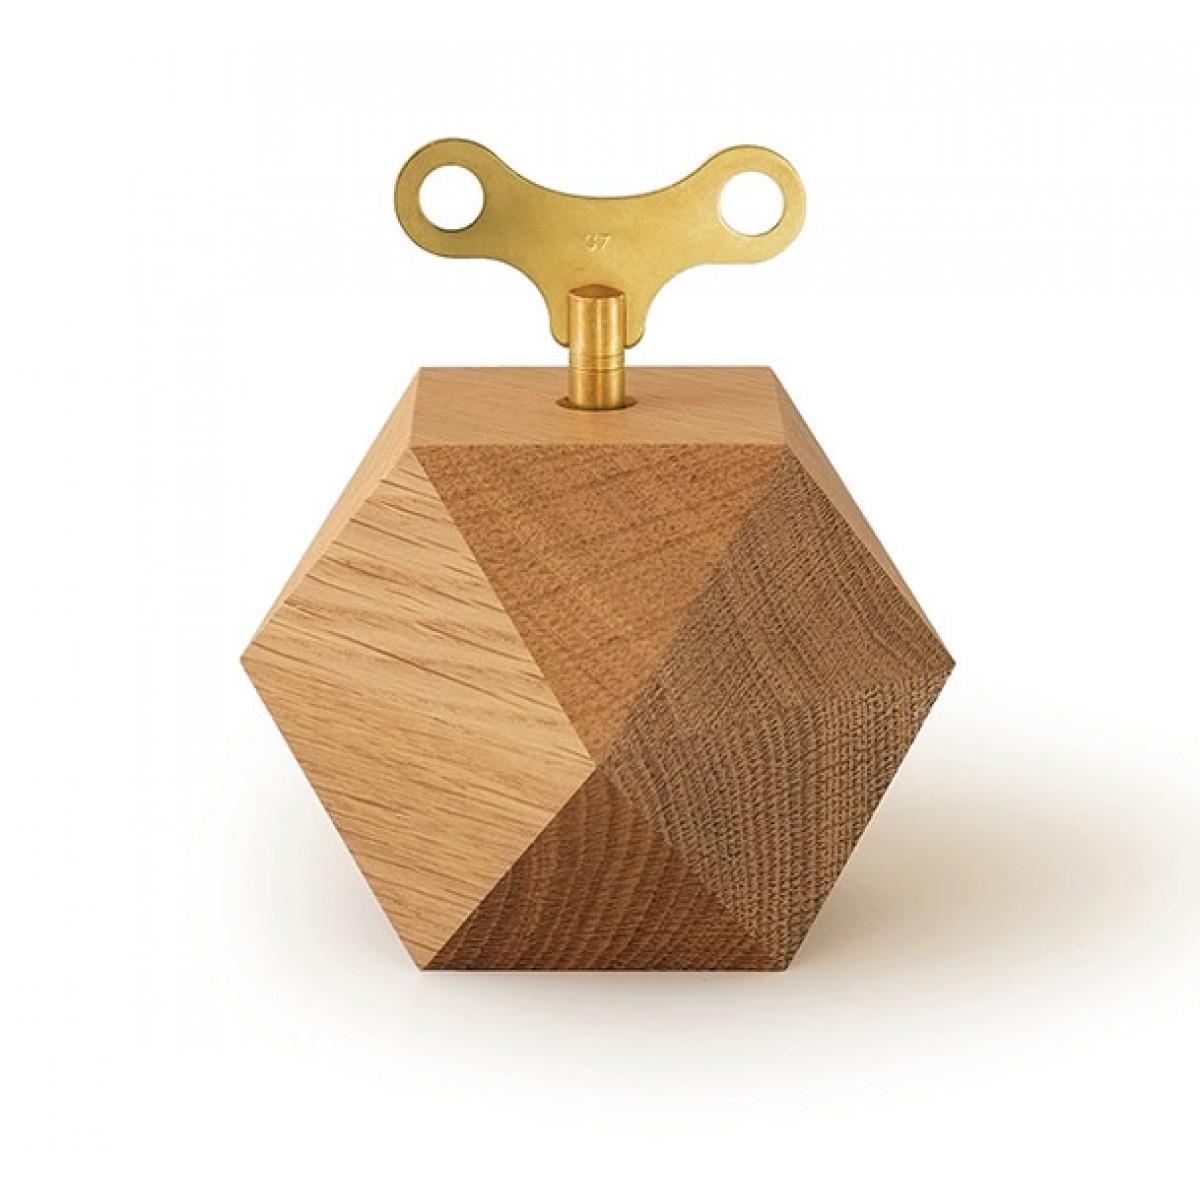 pipandsox-siebensachen-mozart-kugel-diamond-music-box